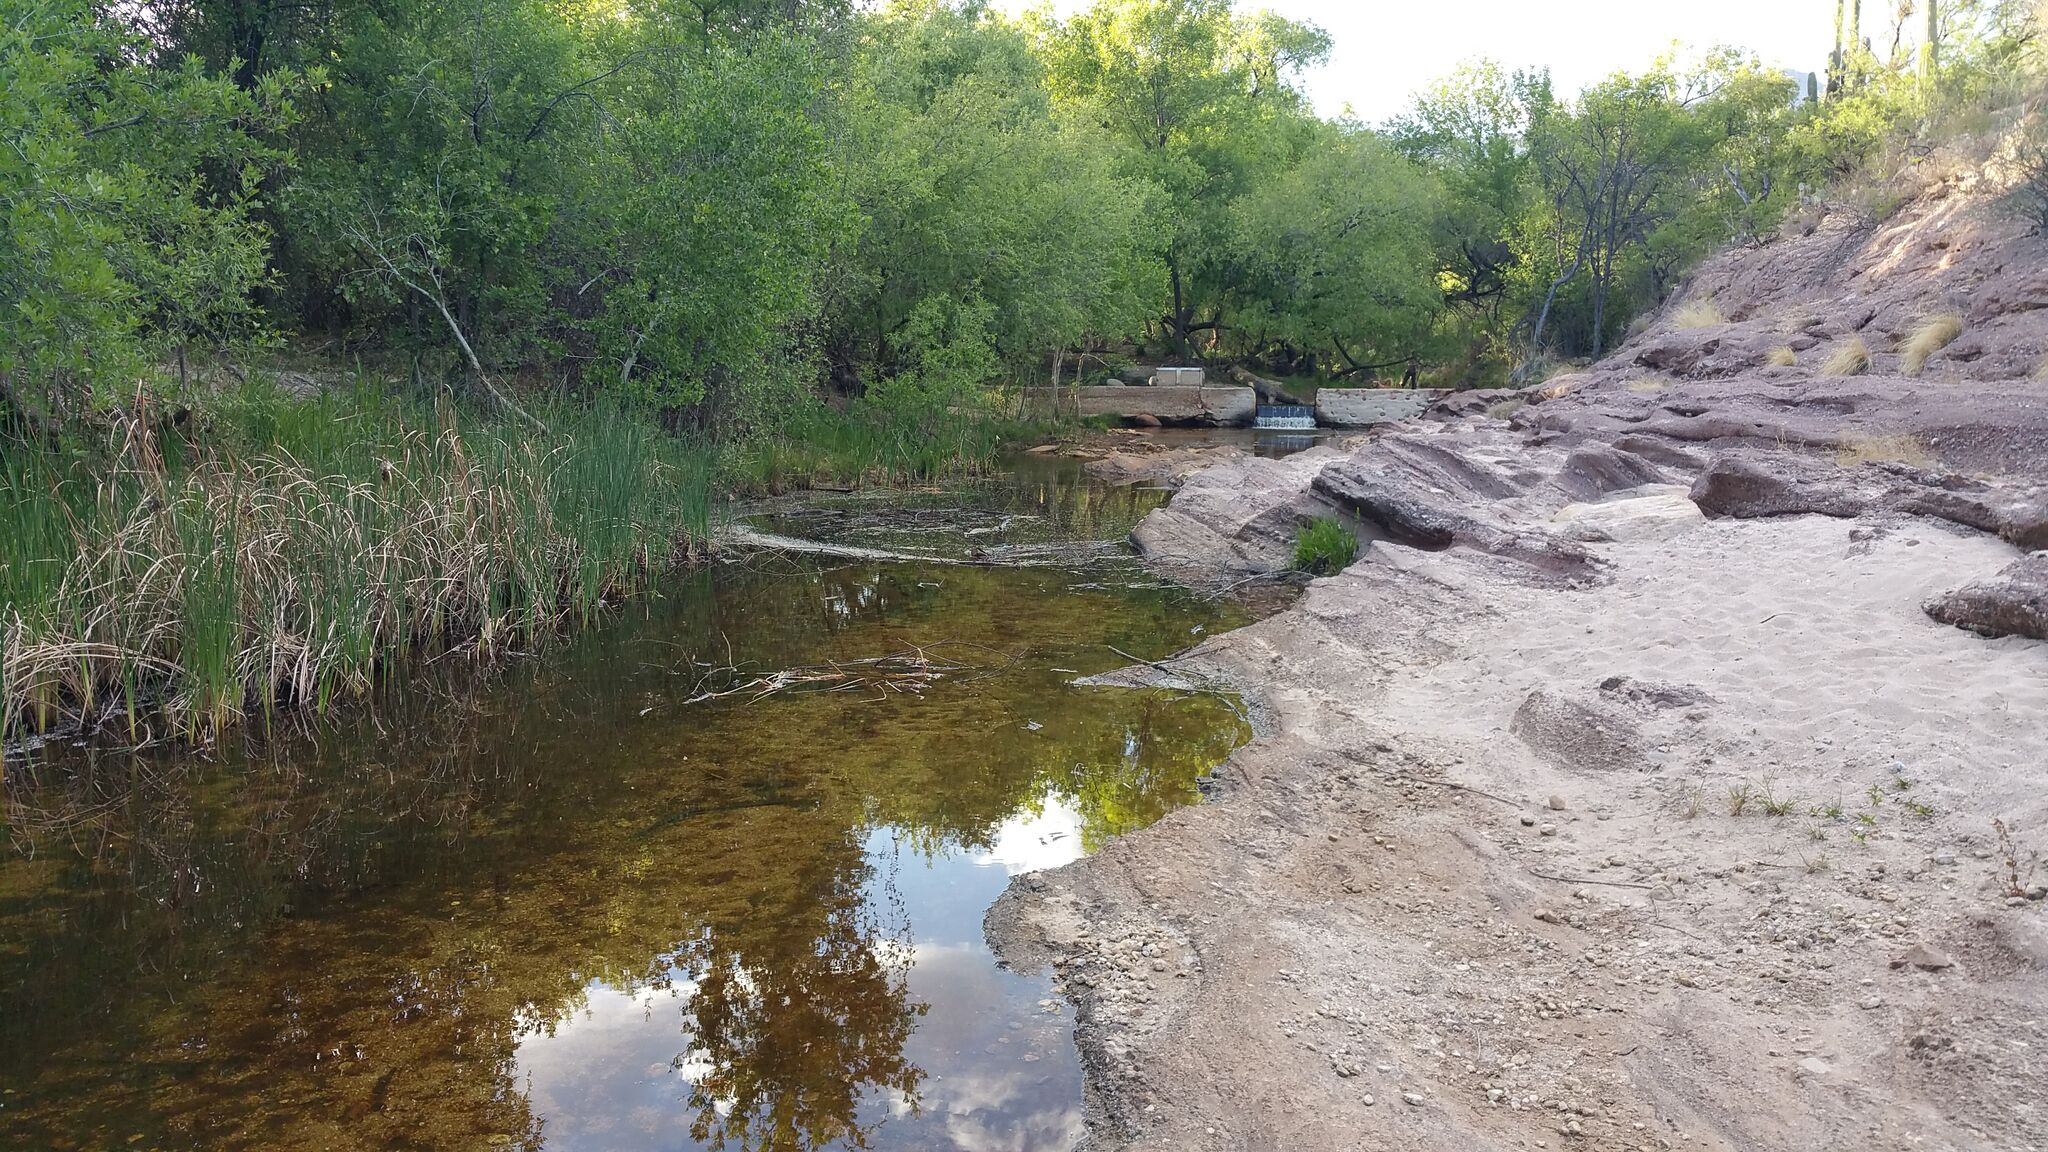 View of Lower Sabino Creek